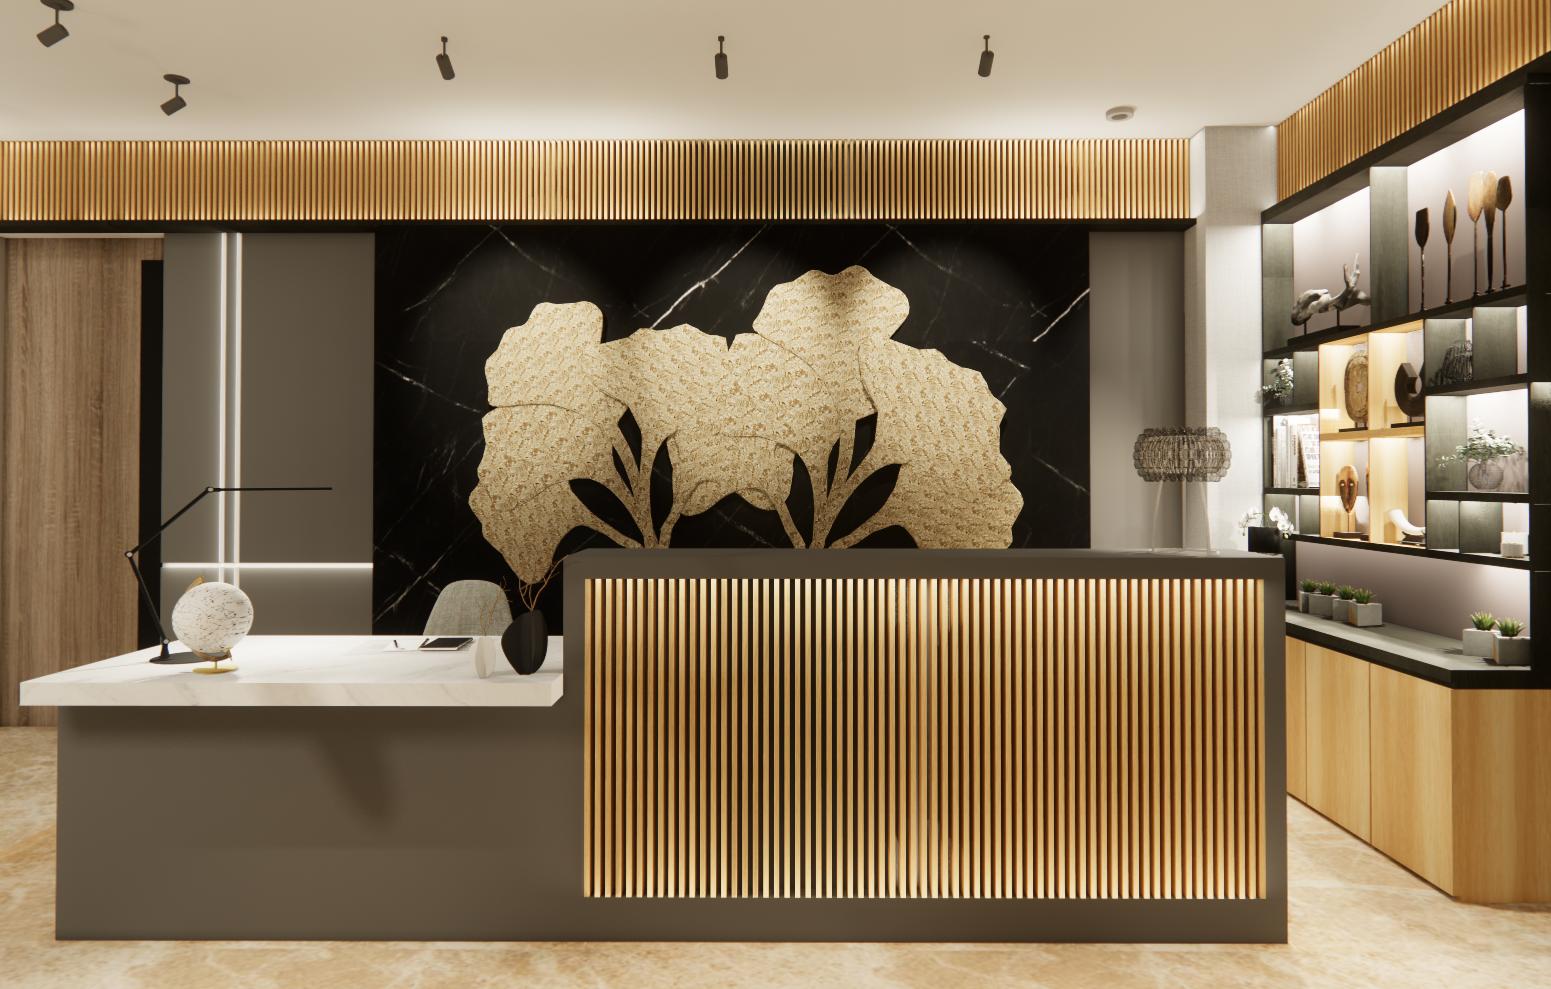 Naniwa Senior Living Center - Lobby 1